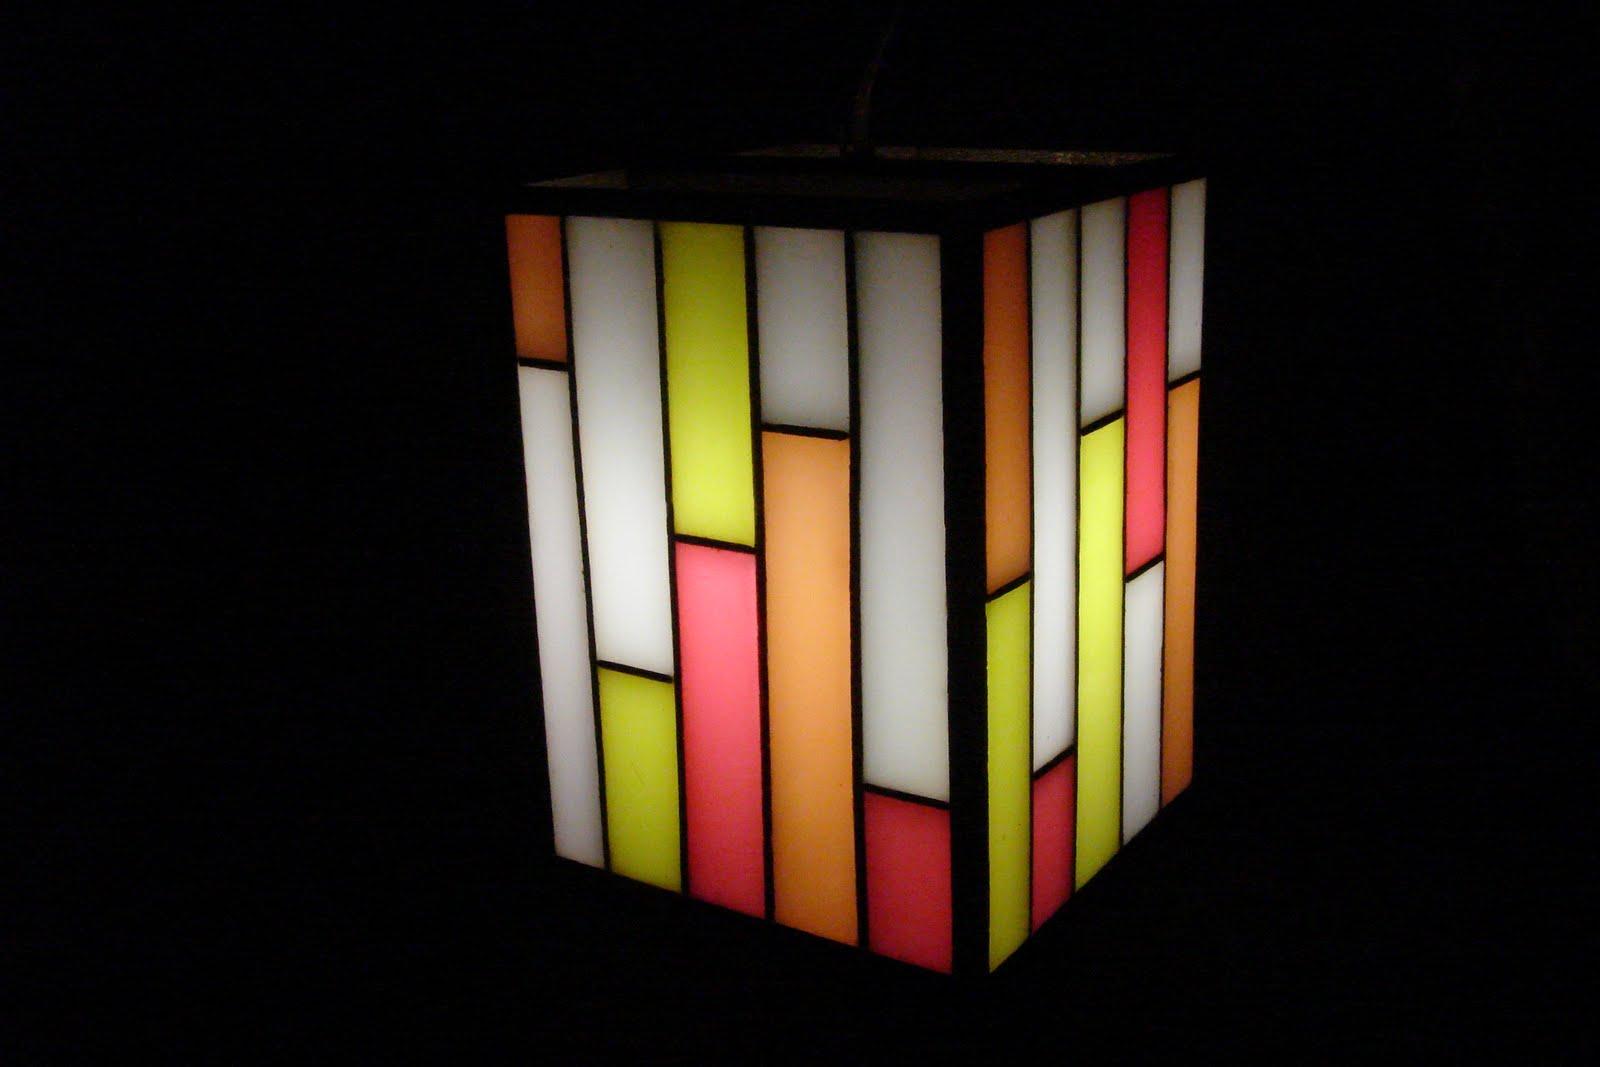 Fanalart luminarias lampara colgantes - Luminarias colgantes ...